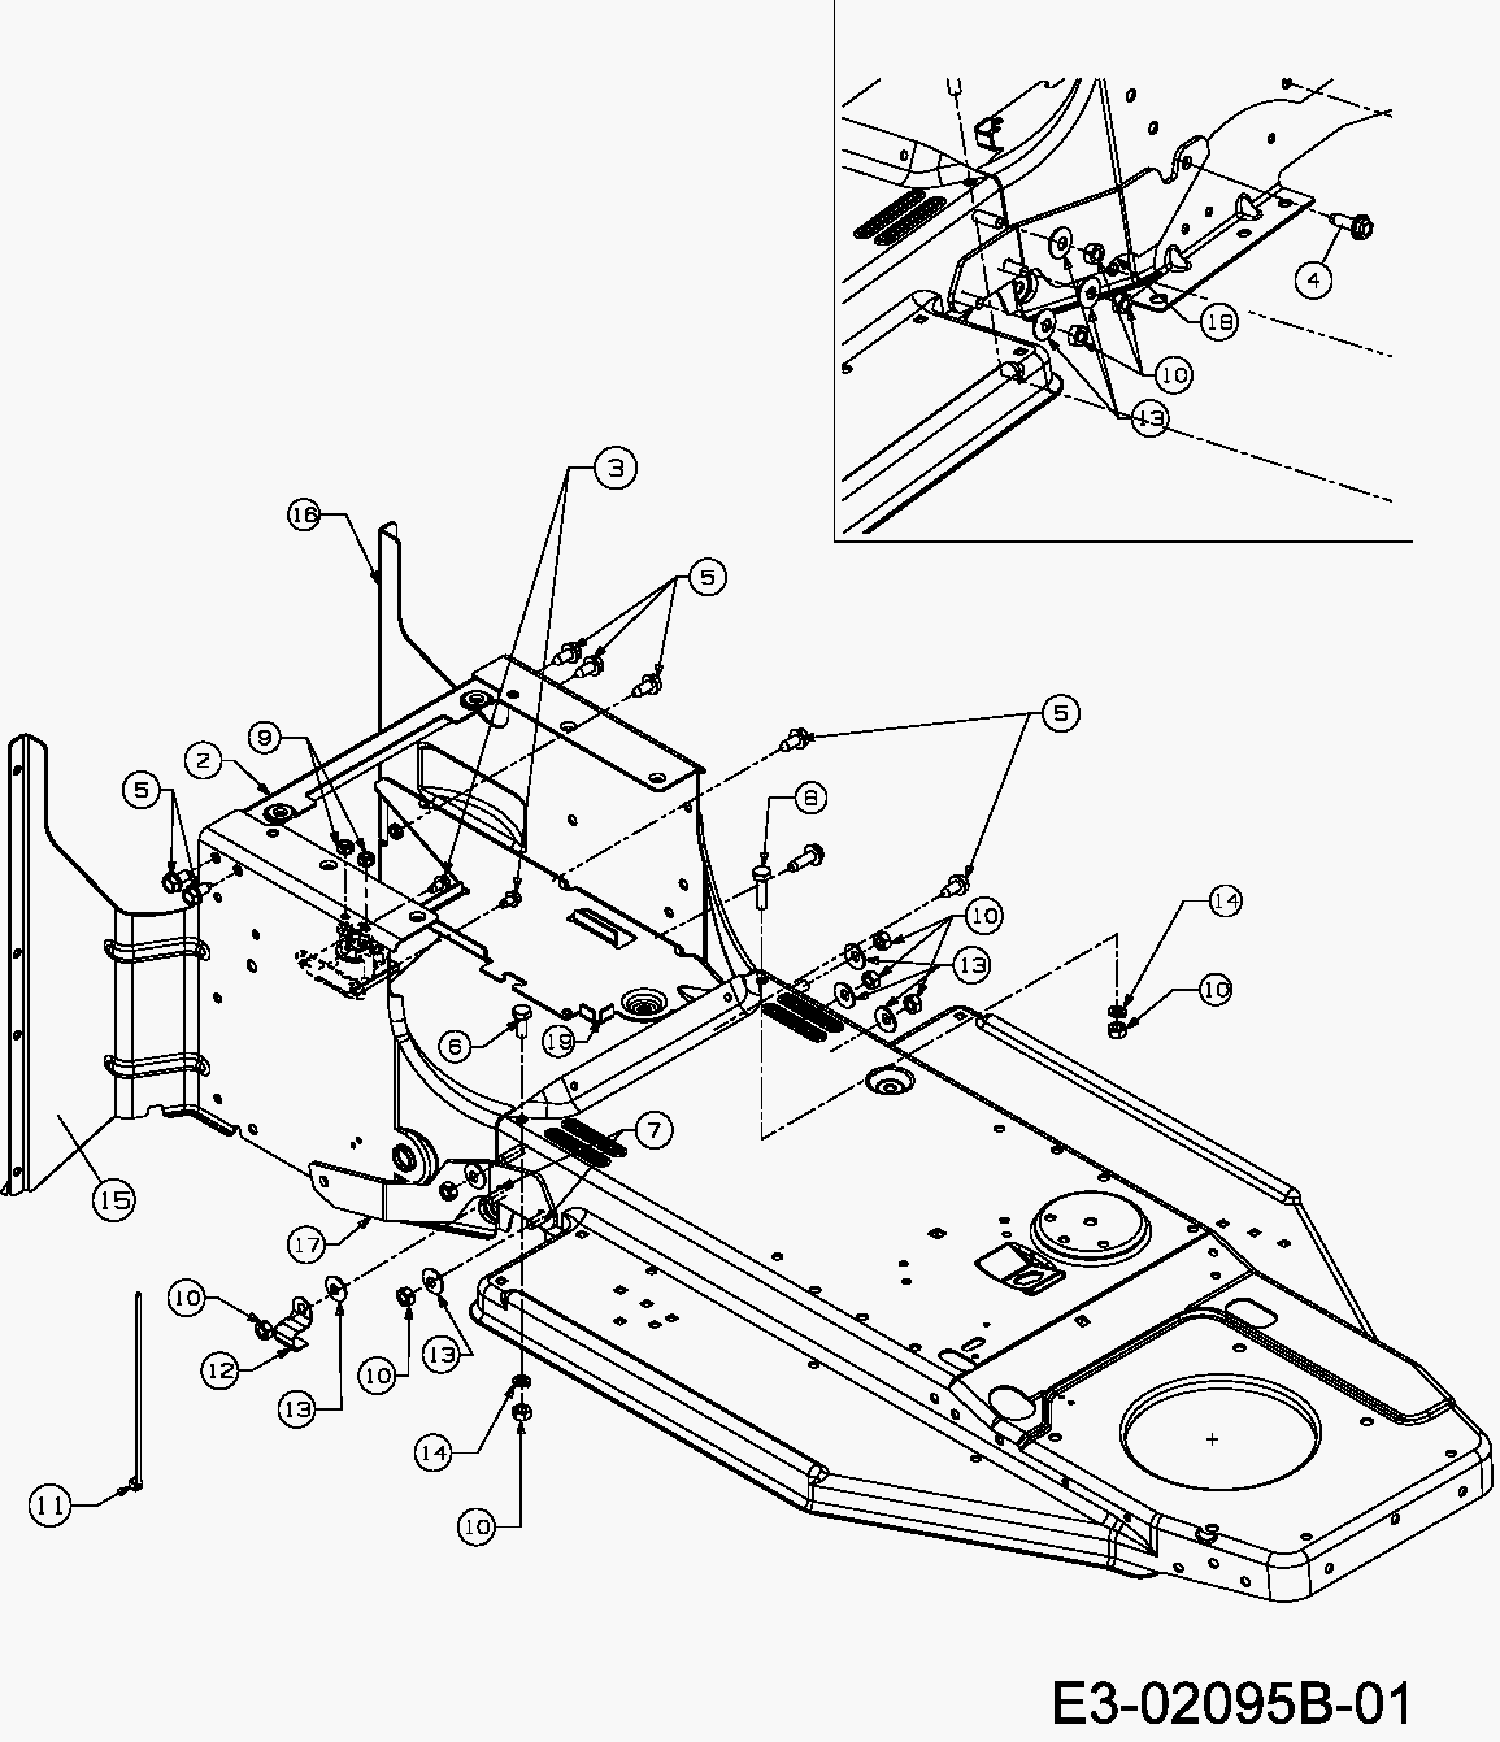 commercial steam boiler system diagrams html